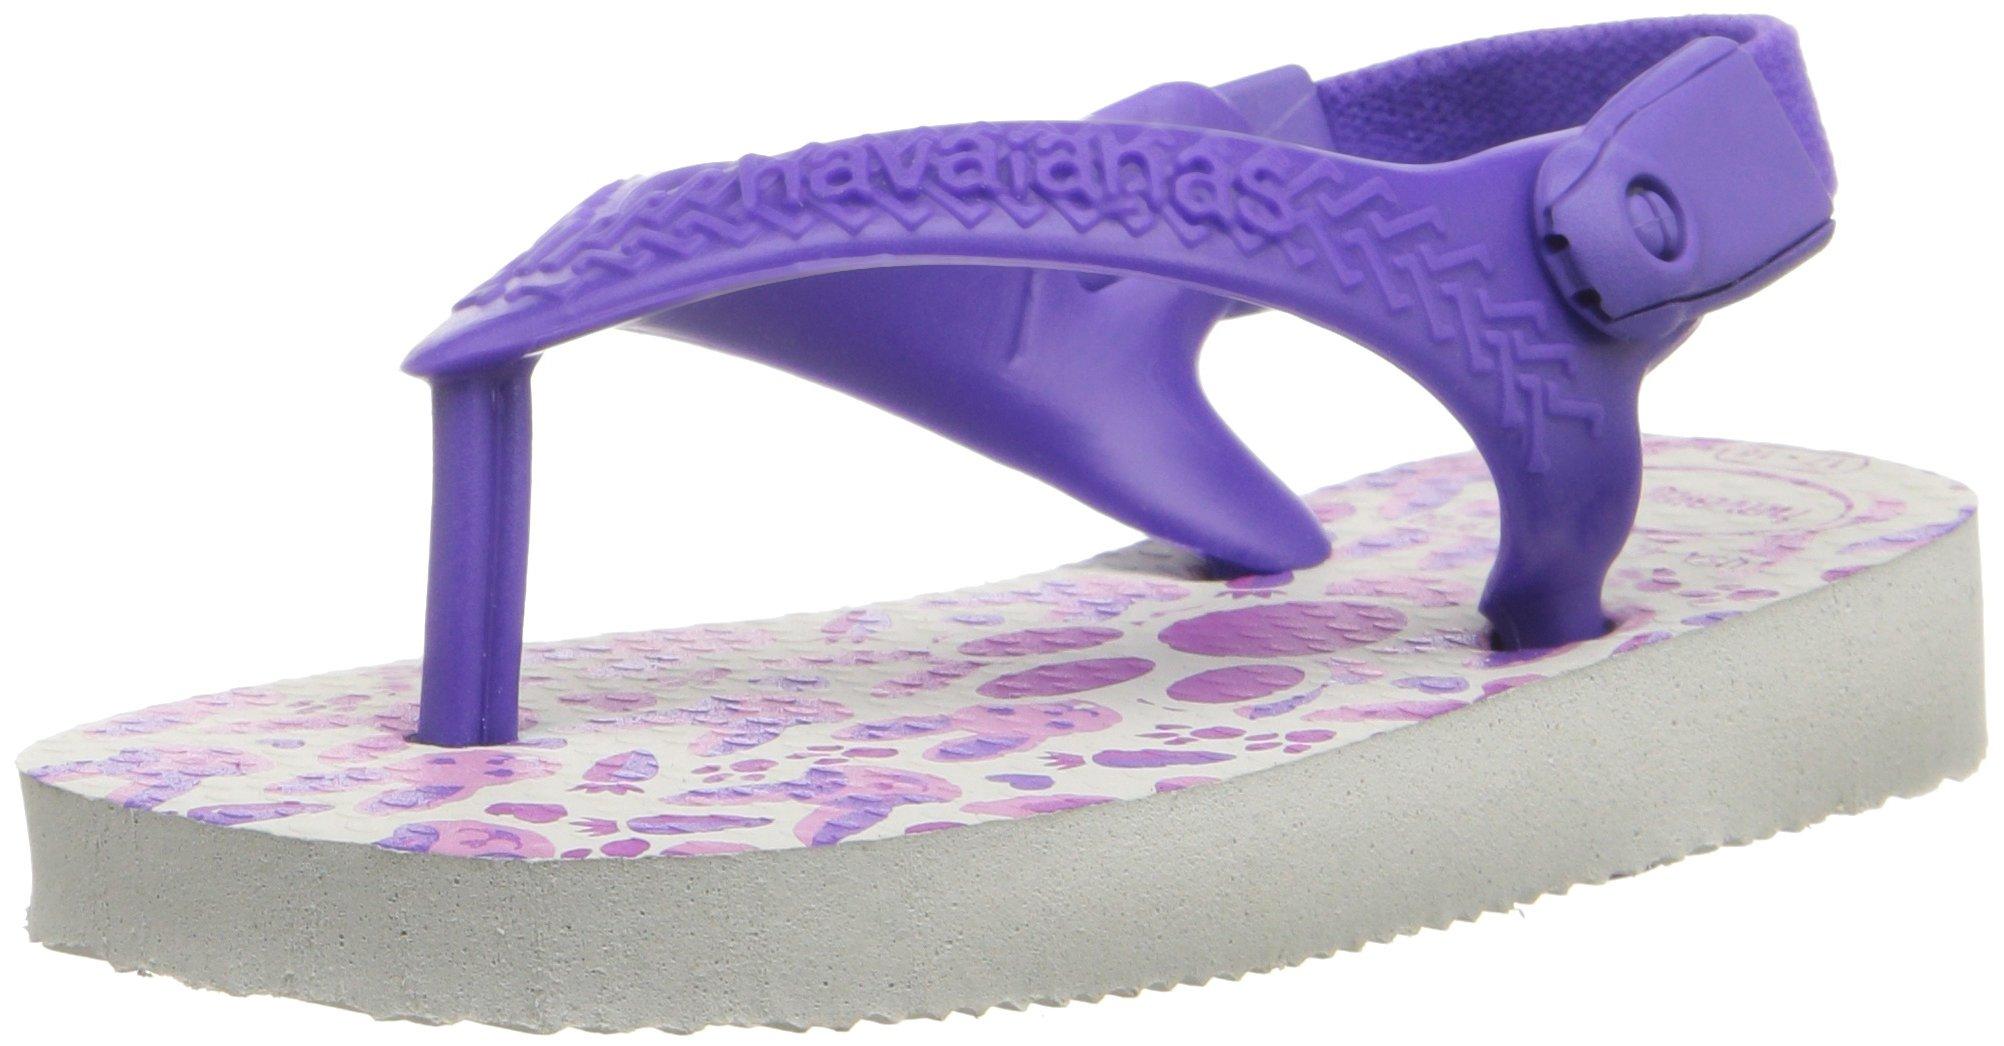 Havaianas Kids Flip Flop Sandals, Baby Pets, Ice Blue/Navy Blue,White/Purple,21 BR (7 M US Toddler)